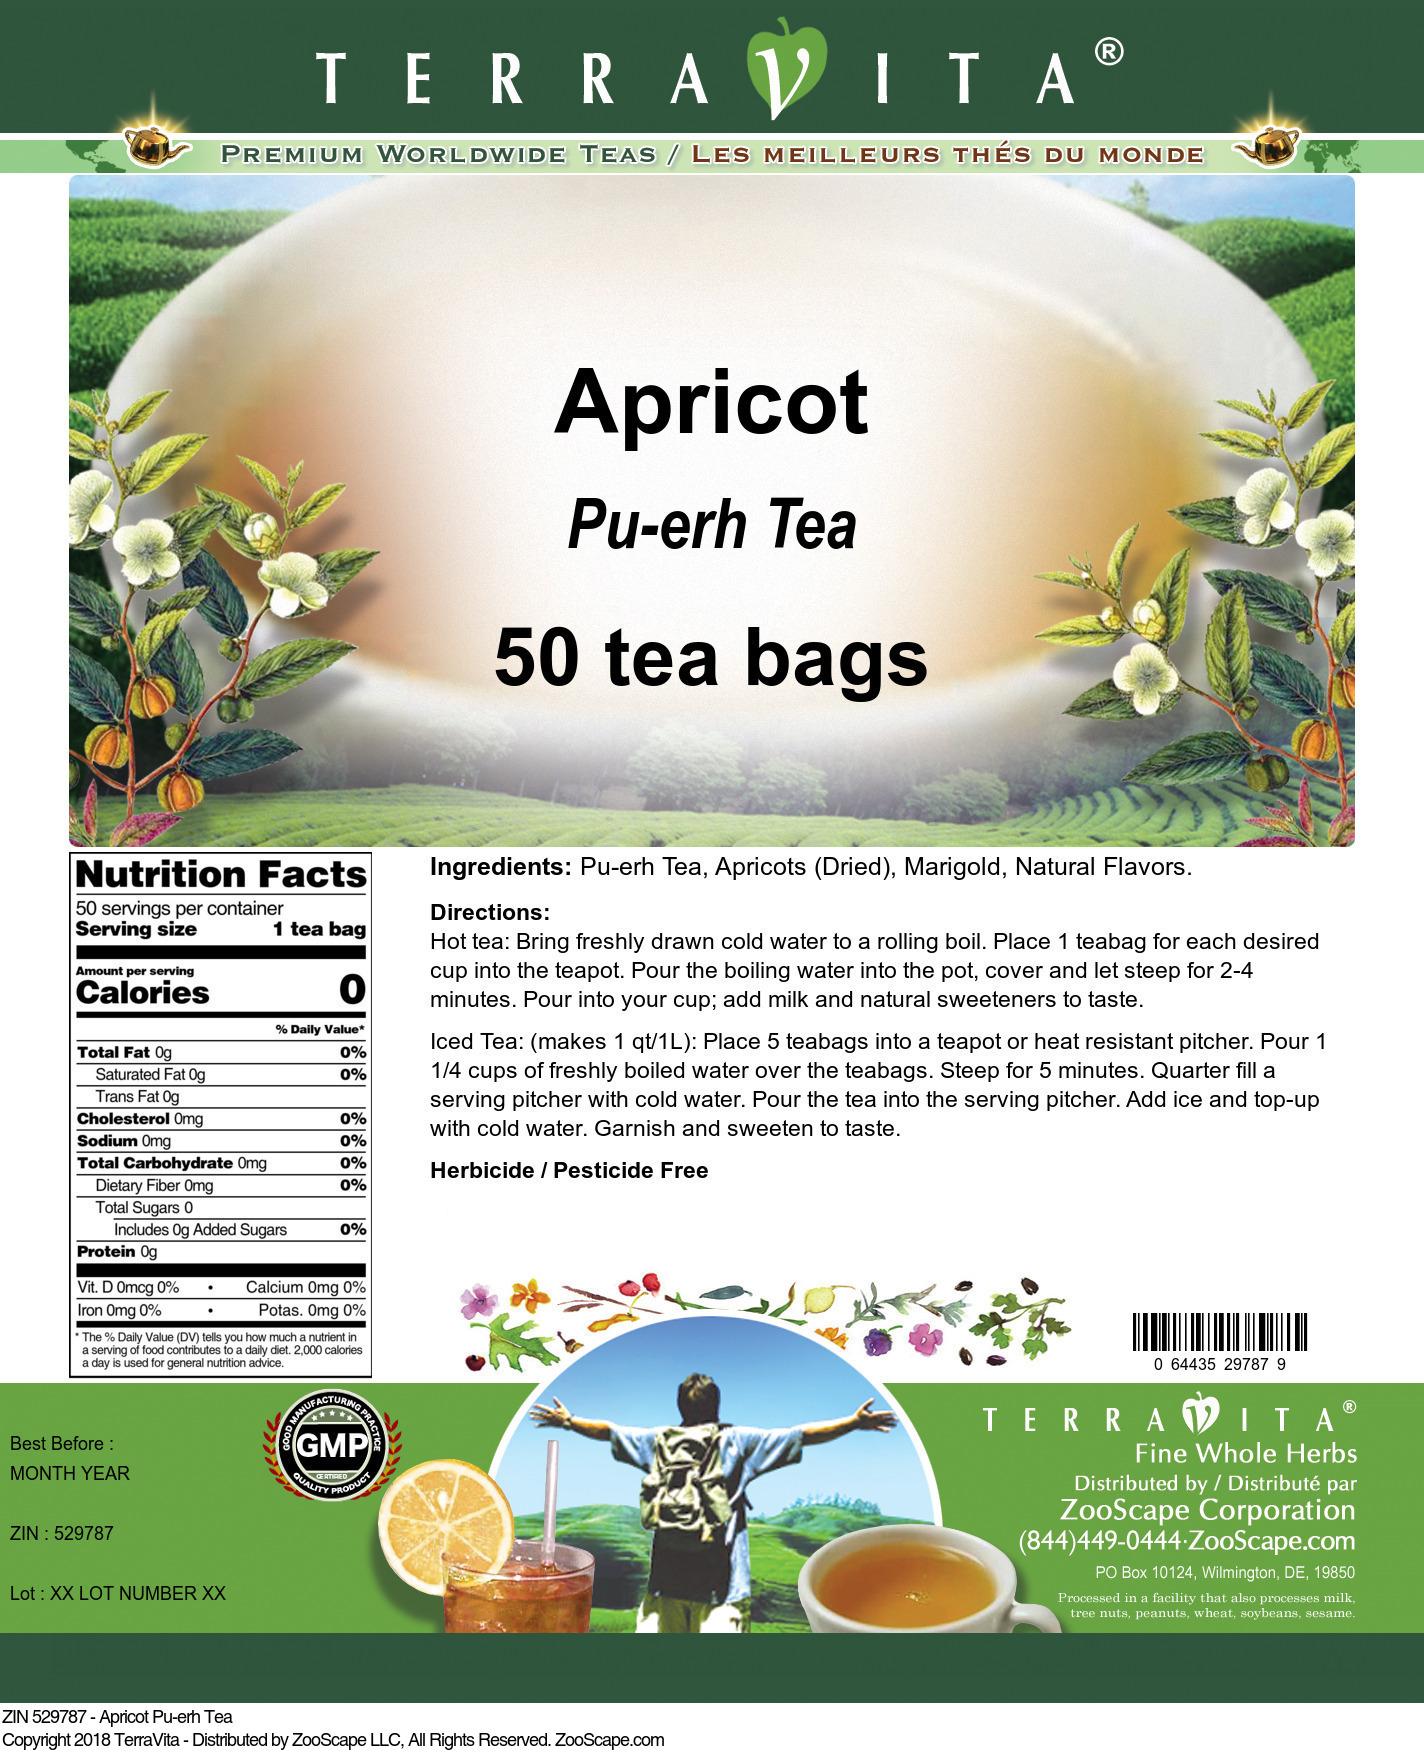 Apricot Pu-erh Tea